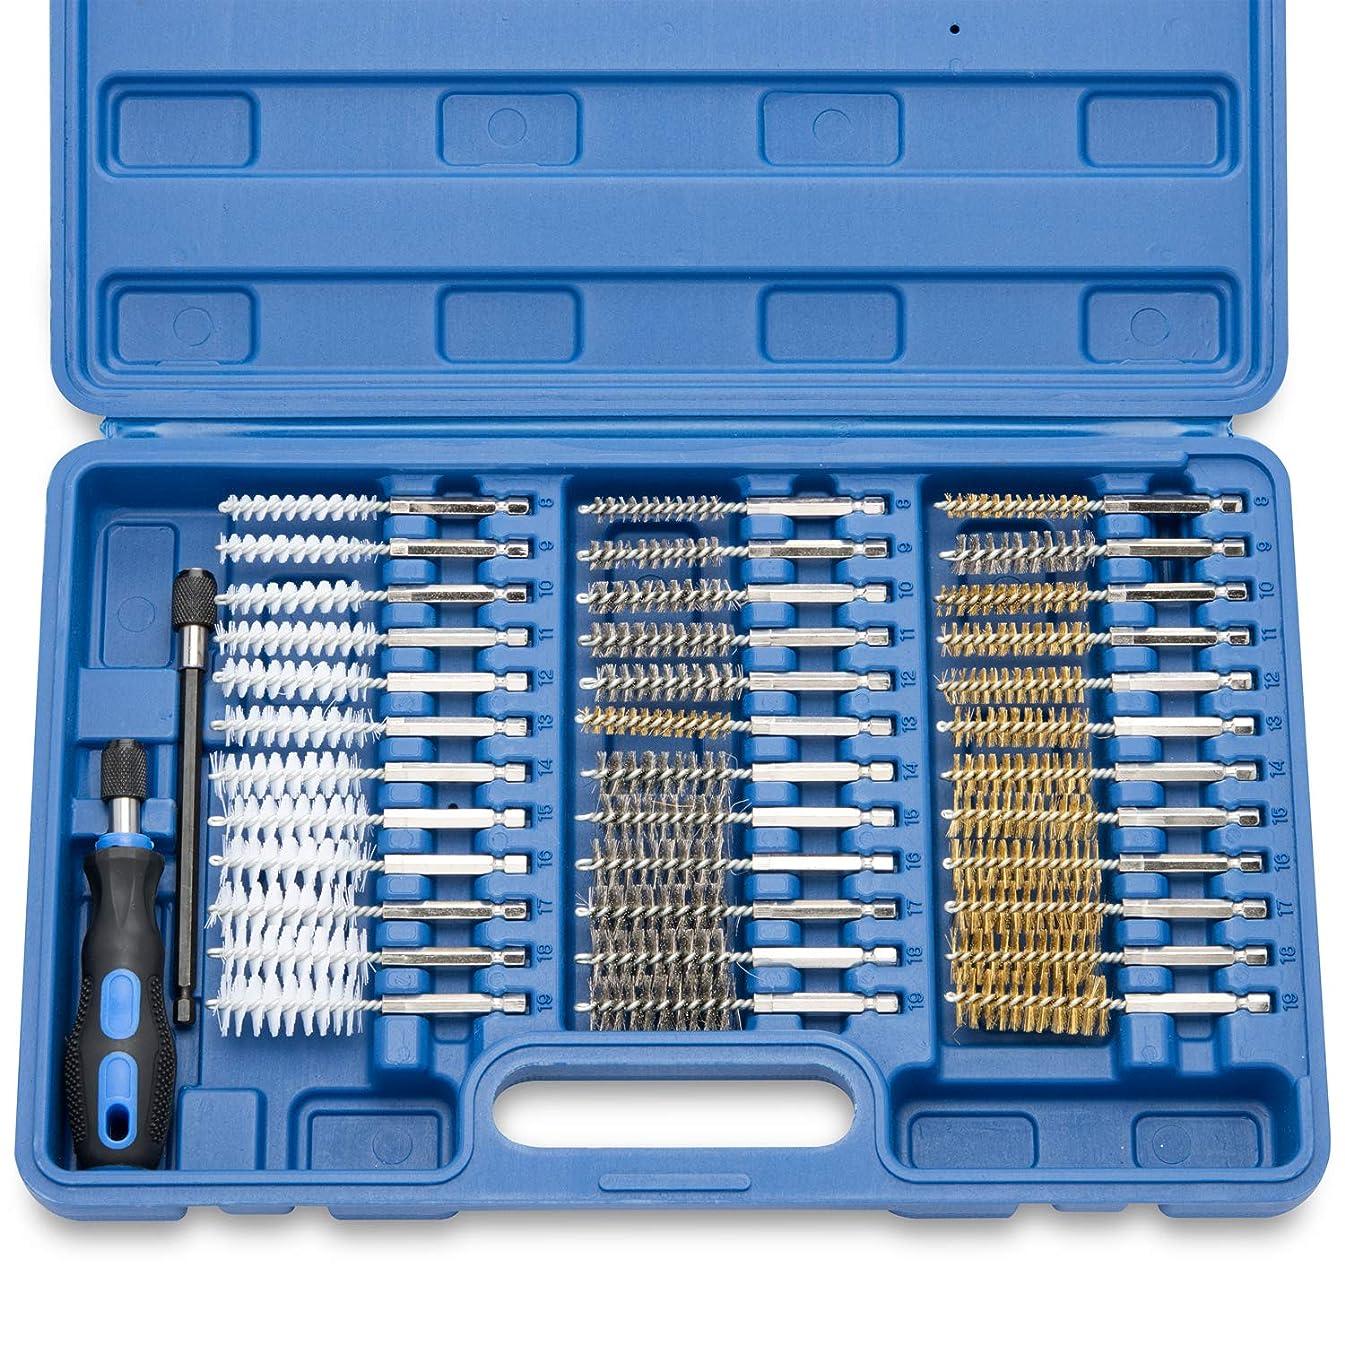 Neiko 00325A Industrial Wire Hex Shank Brush Set, 38 Piece| 1/4